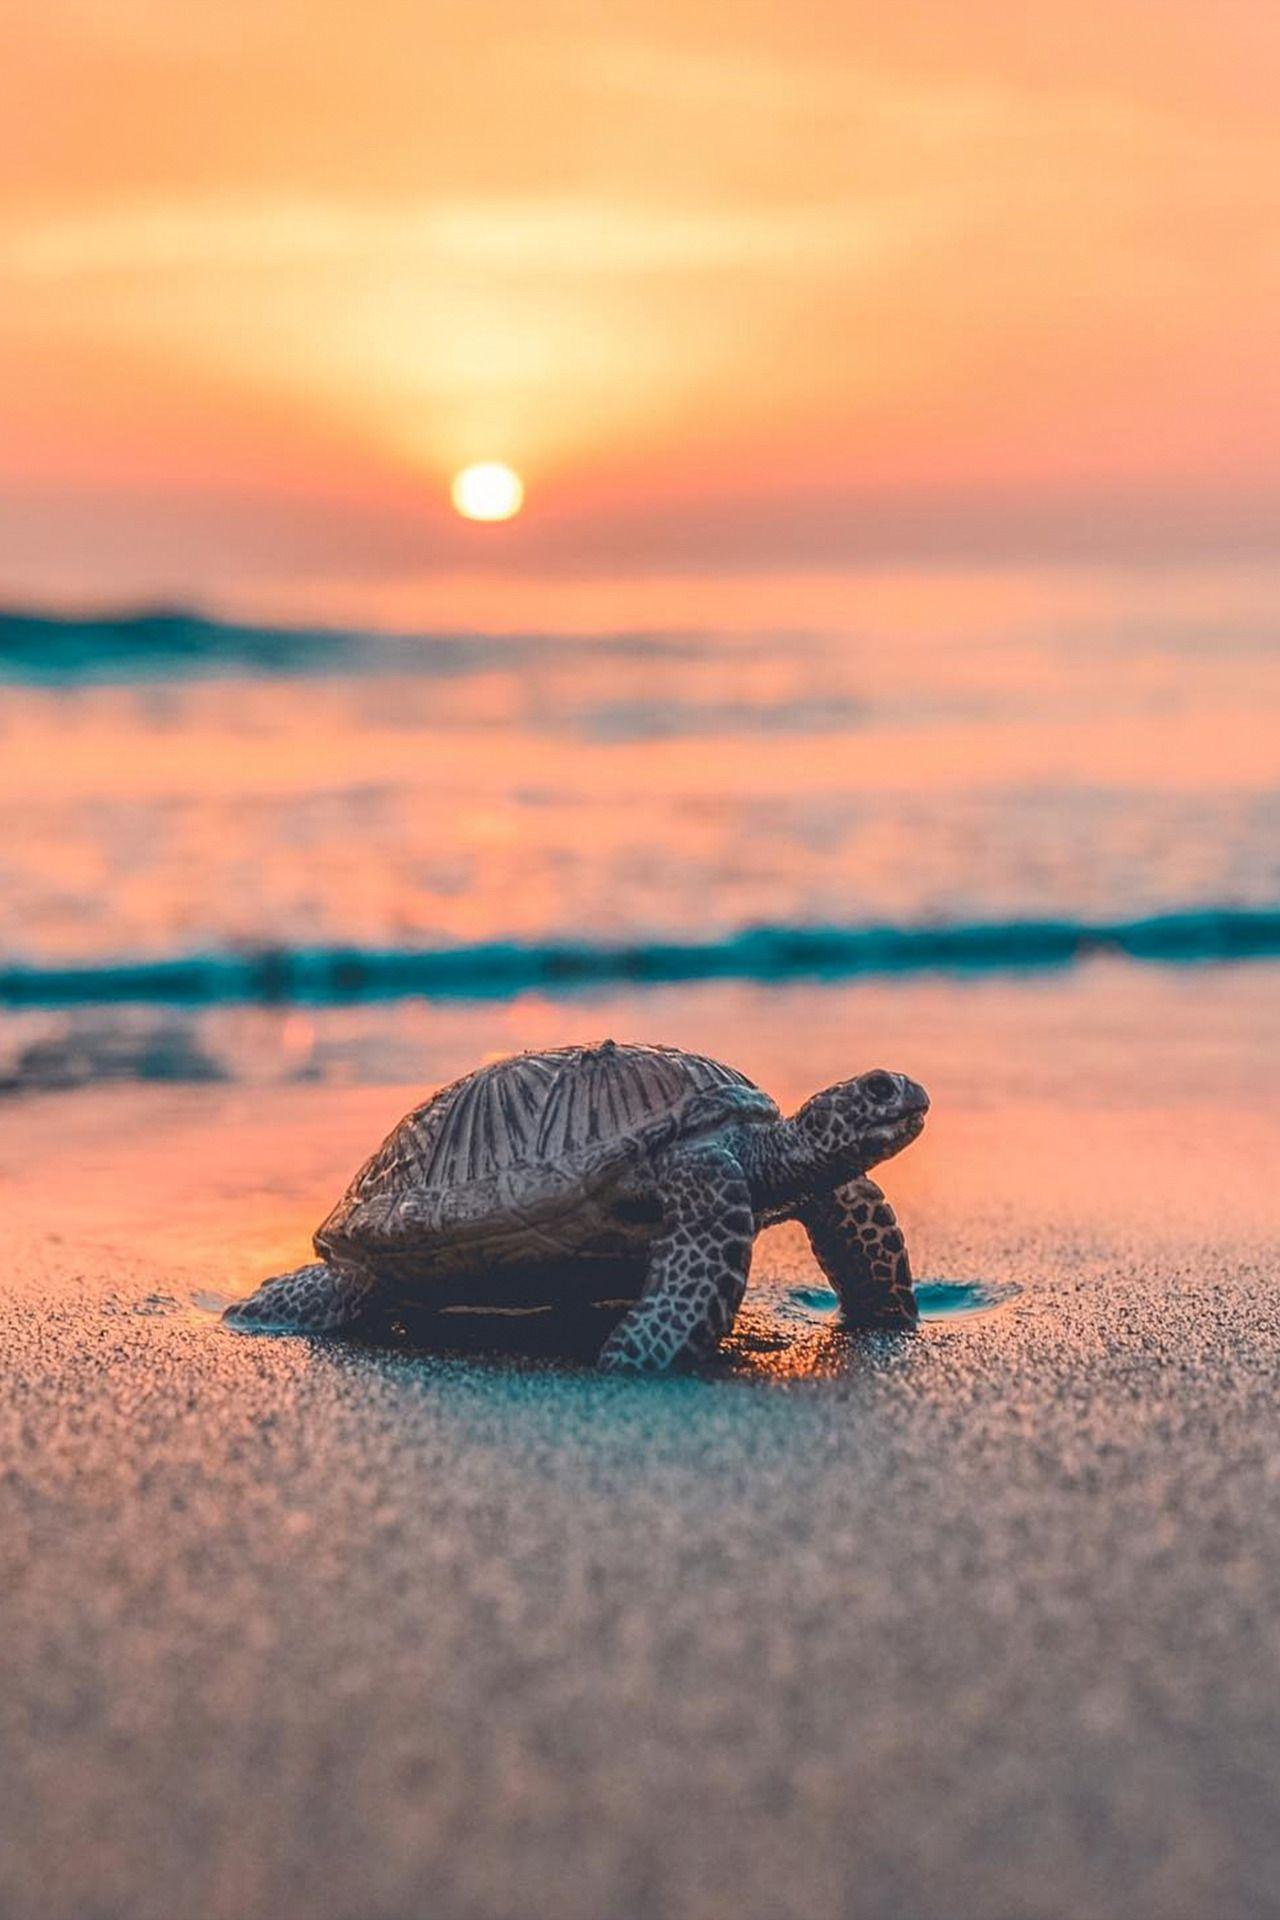 Desvre Baby sea turtles, Turtle, Cute turtles